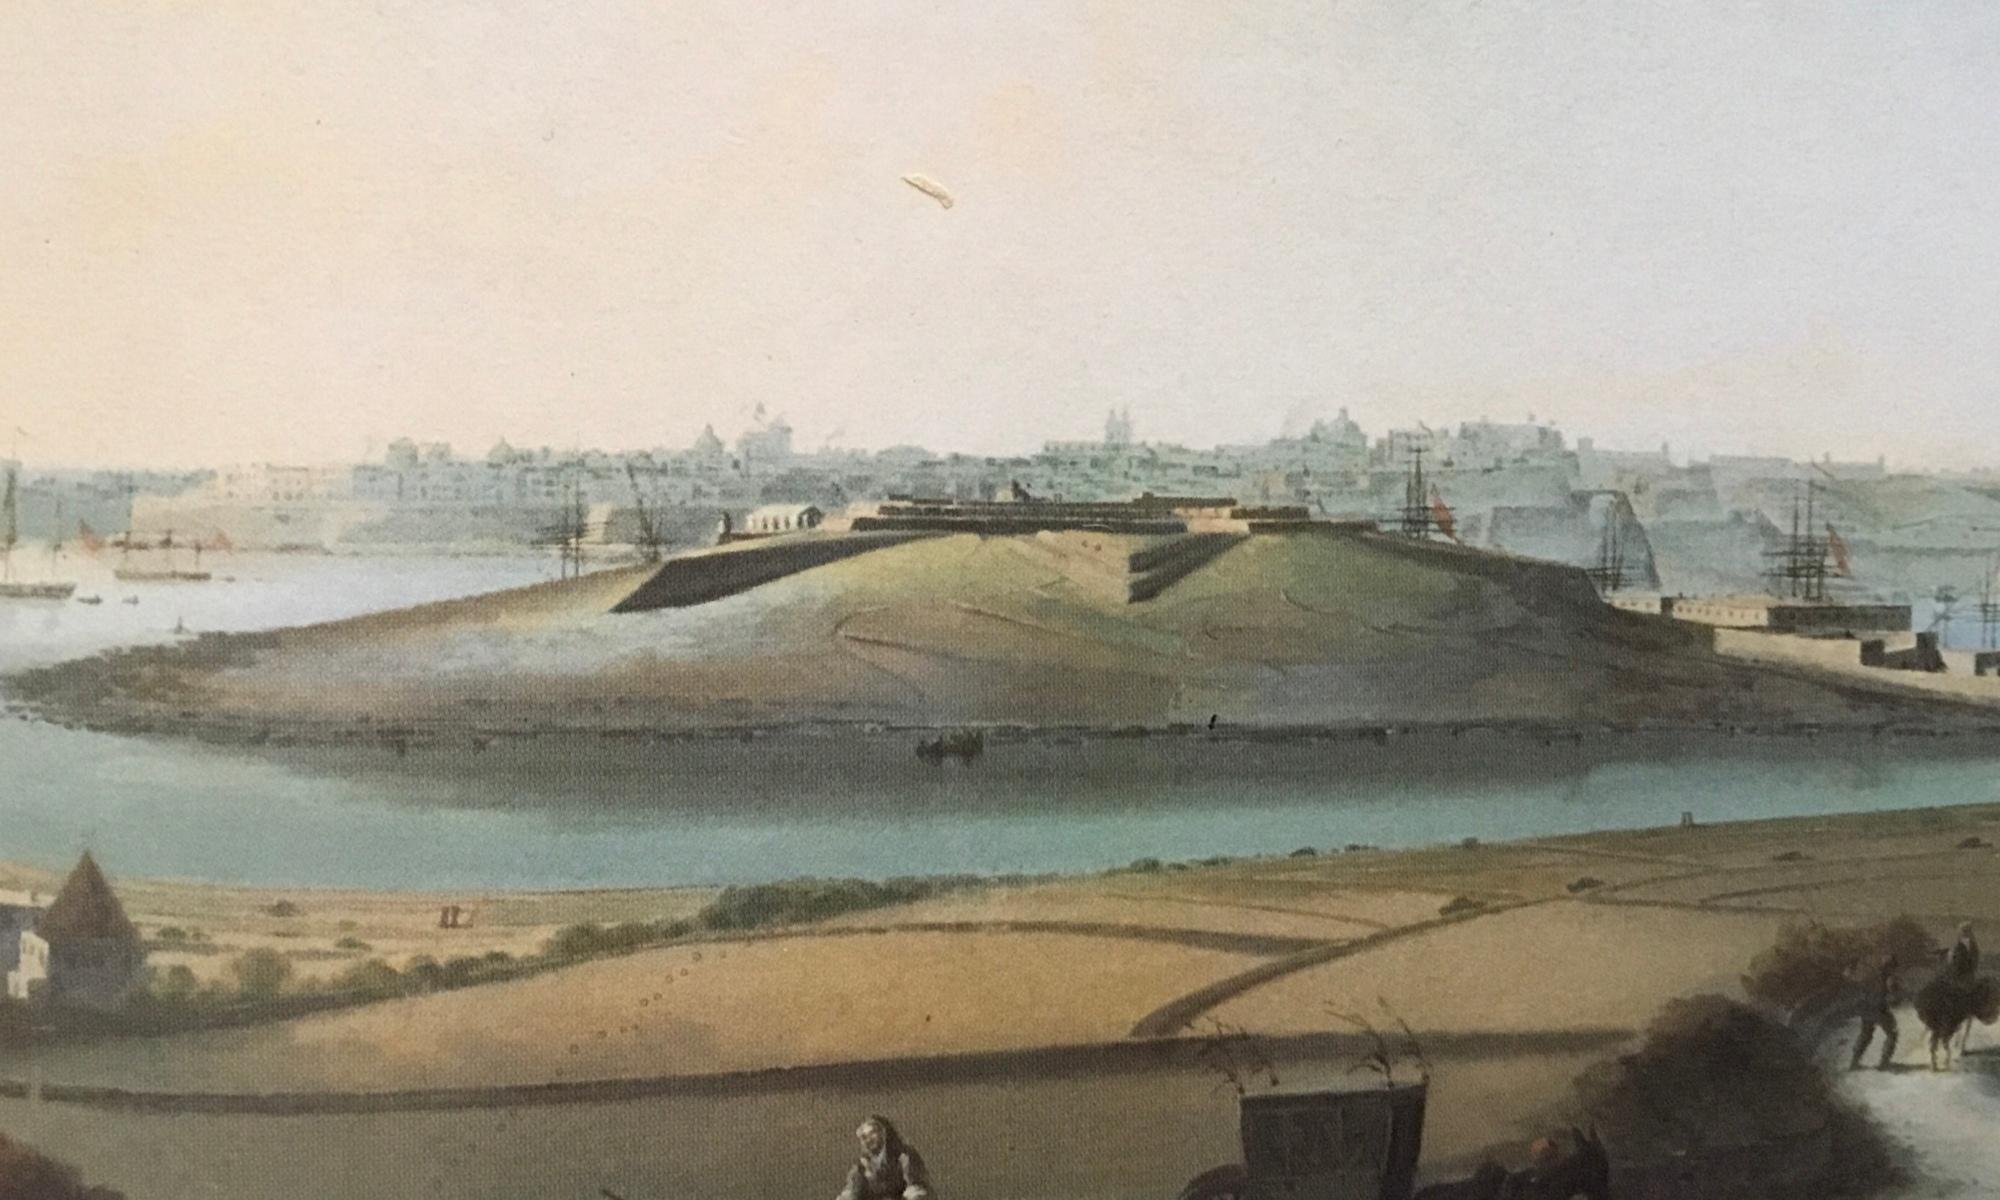 Image of Manoel Island (1800s) by Giorgio Pullicino